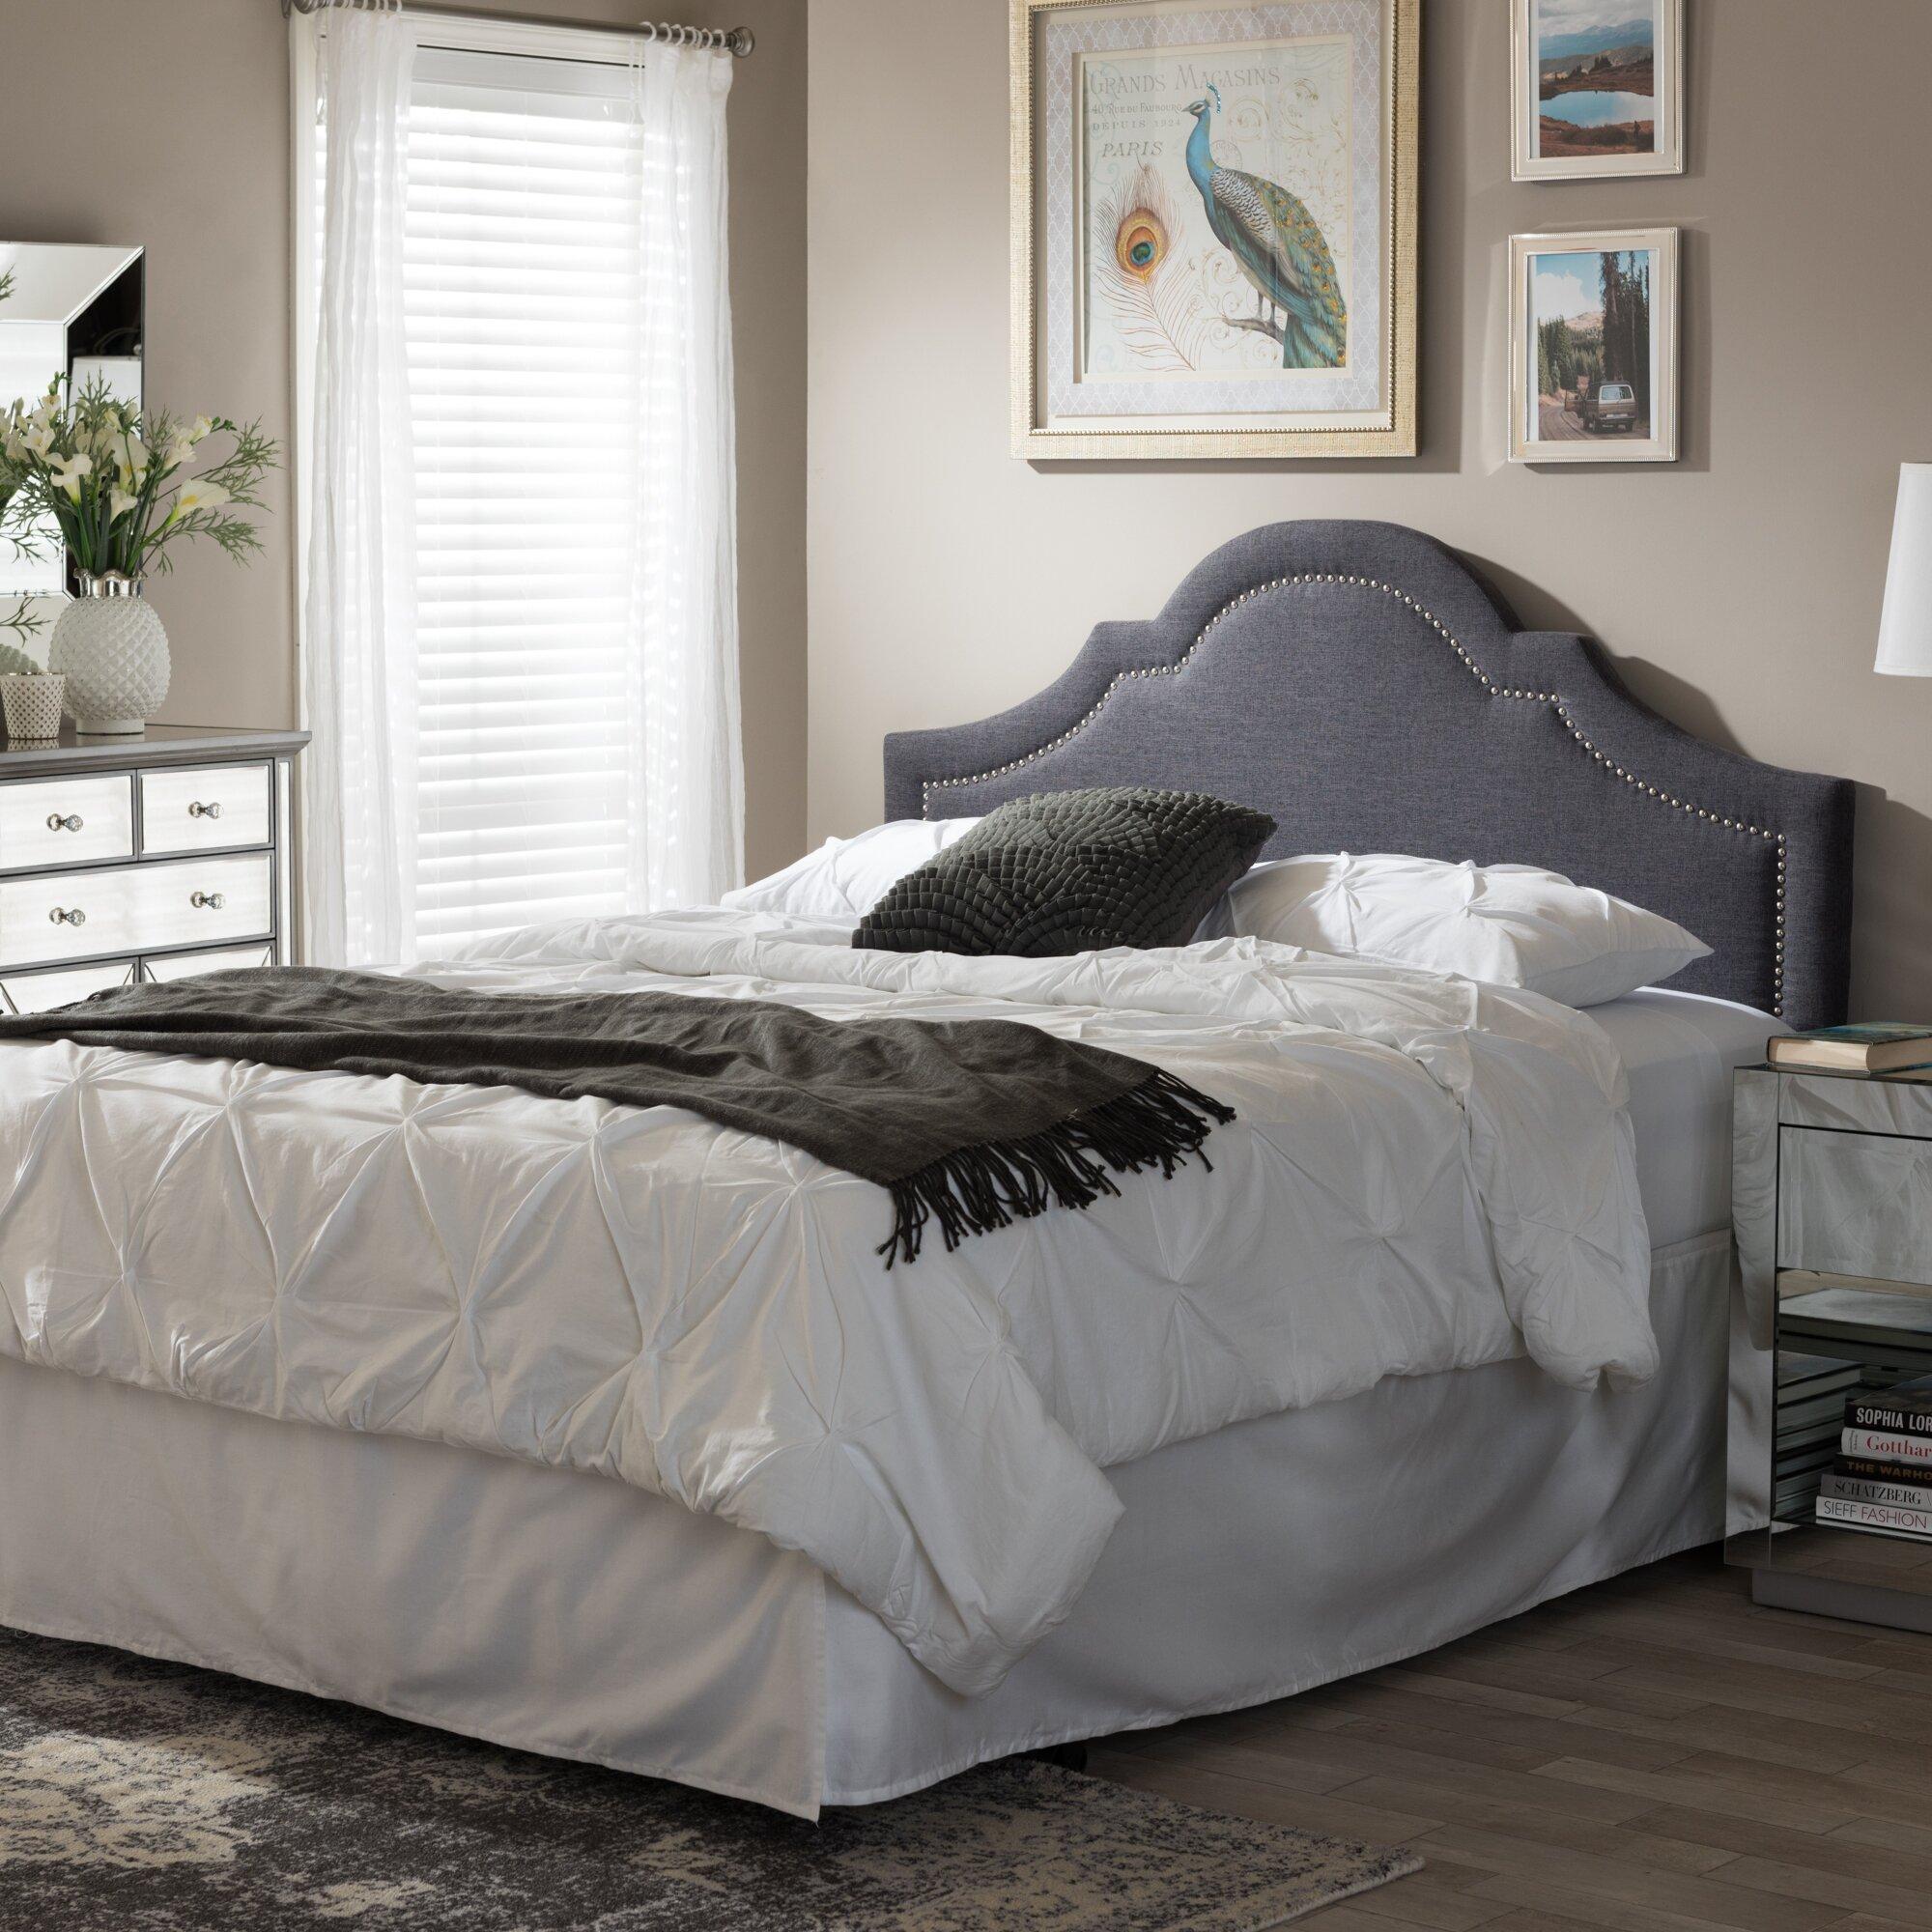 Wholesale interiors baxton studio celio upholstered Grey tufted headboard